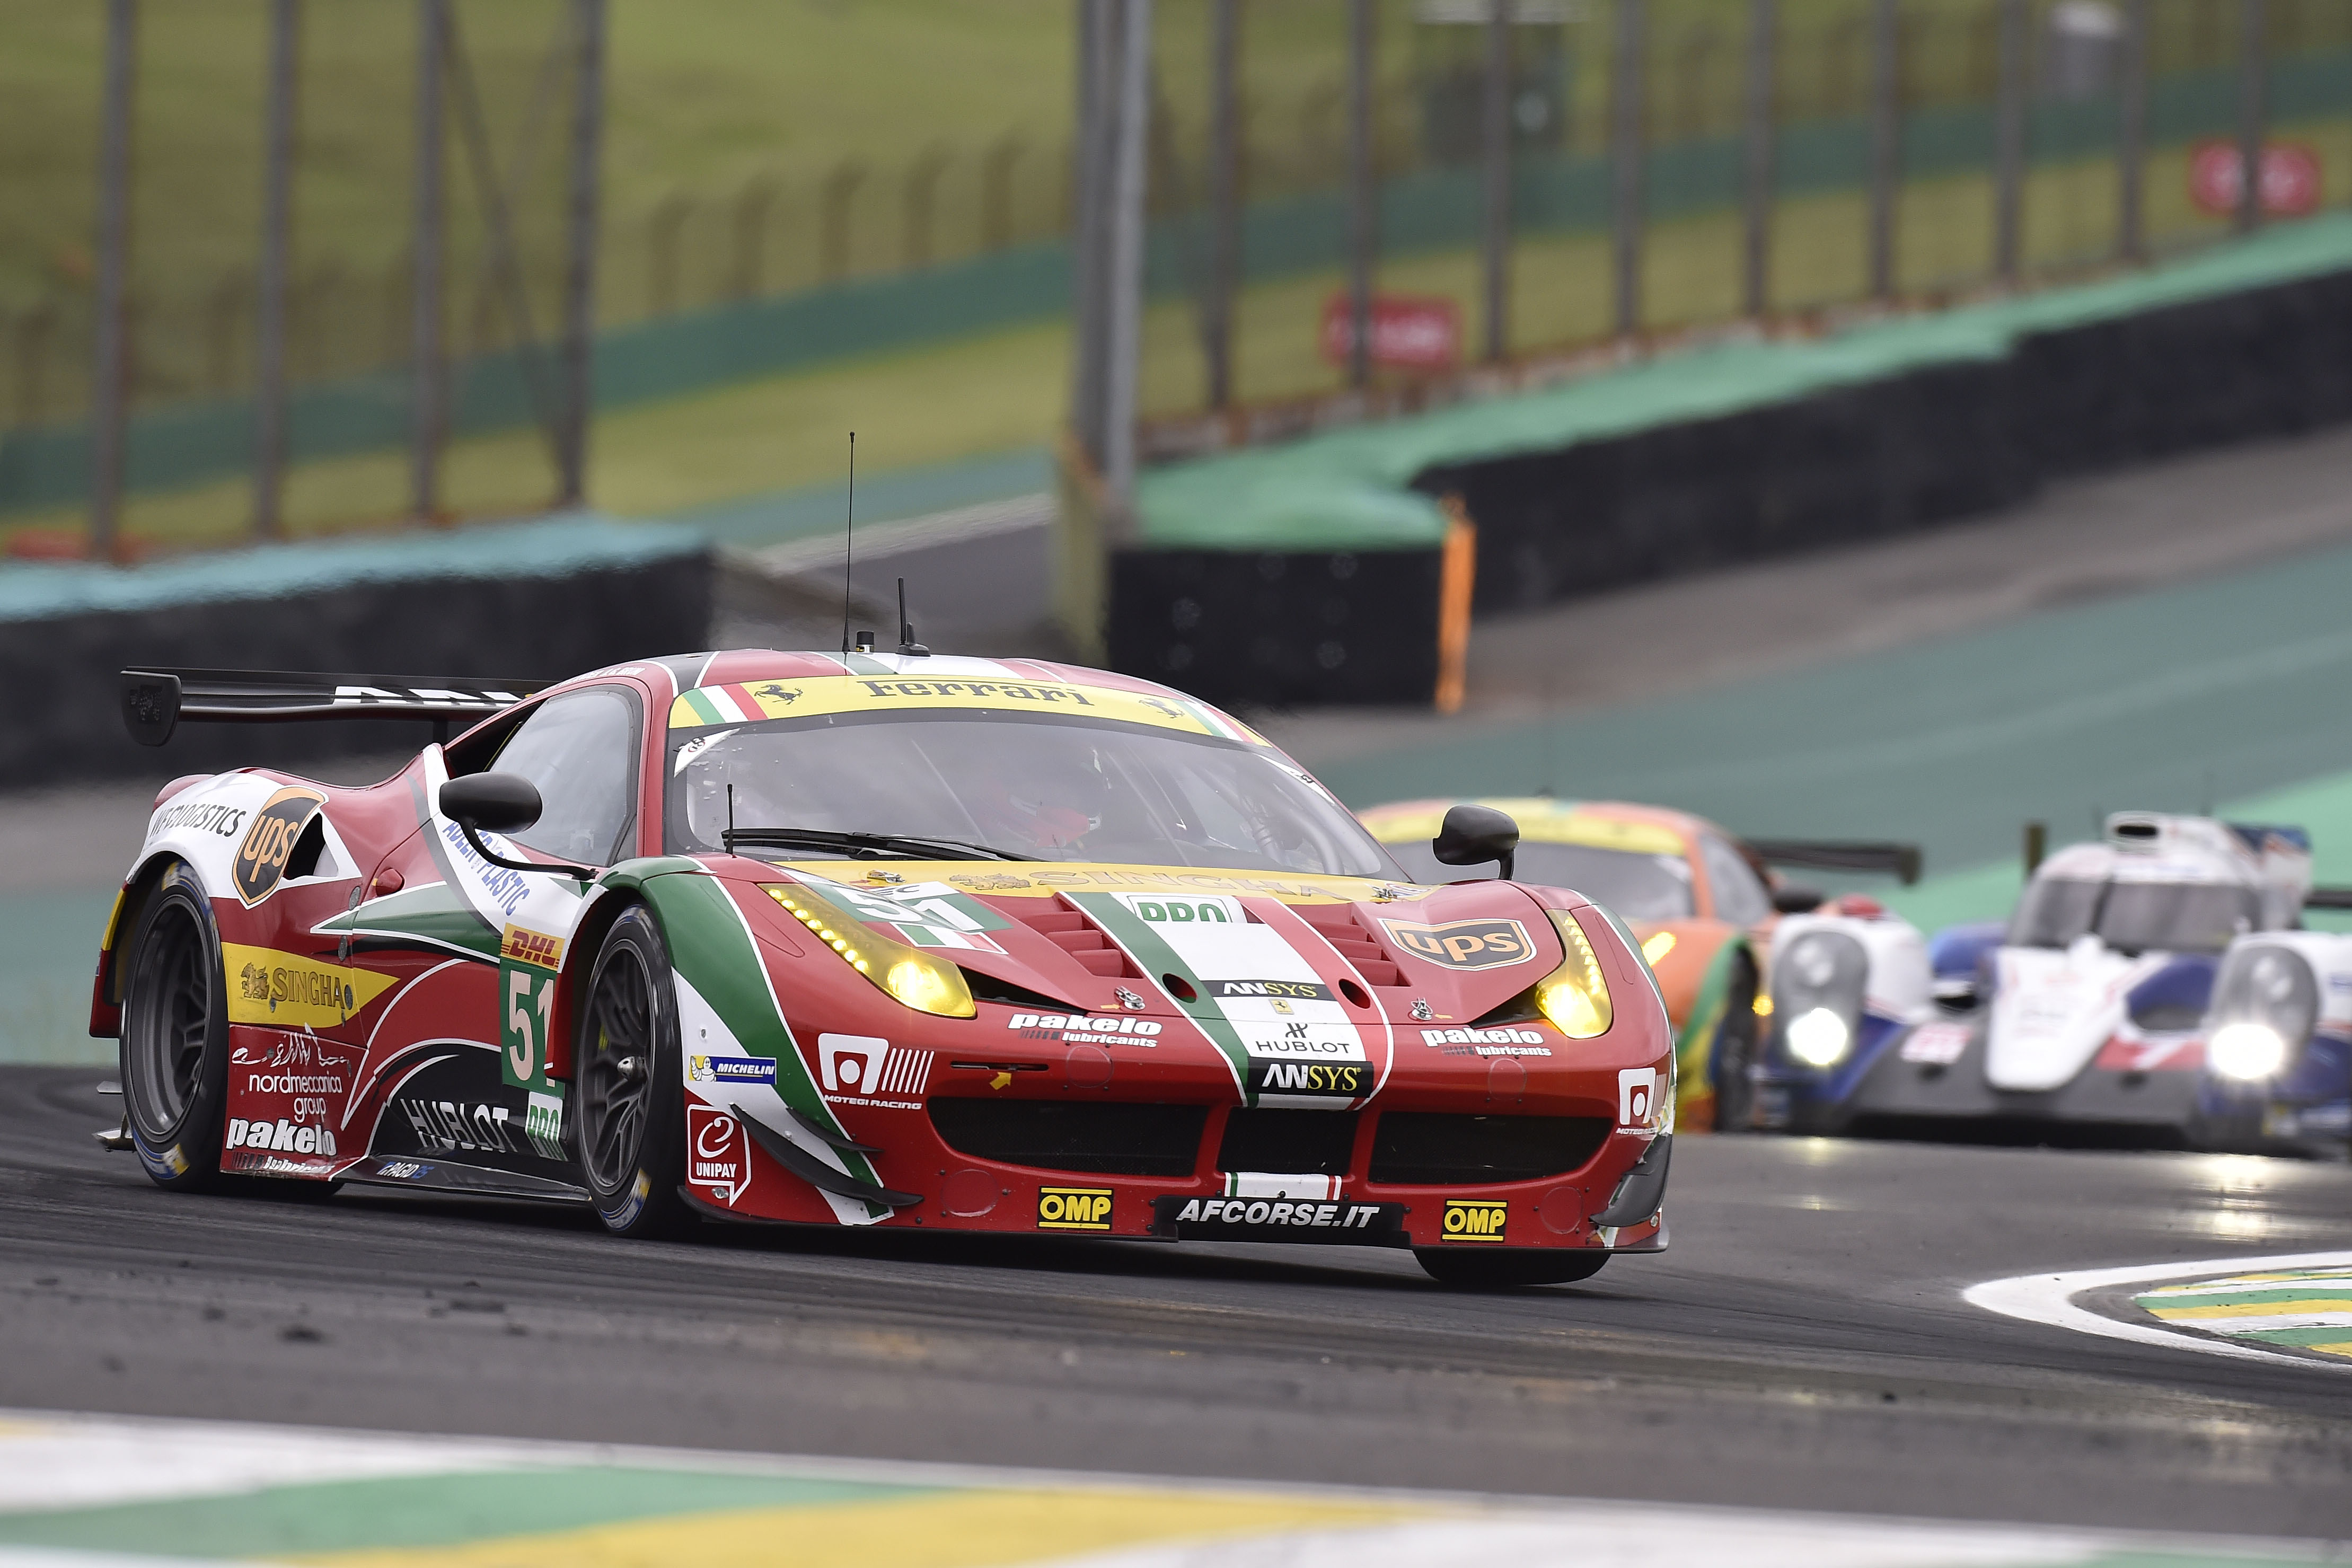 FIA WEC: qualifiche amare per la Ferrari in Brasile